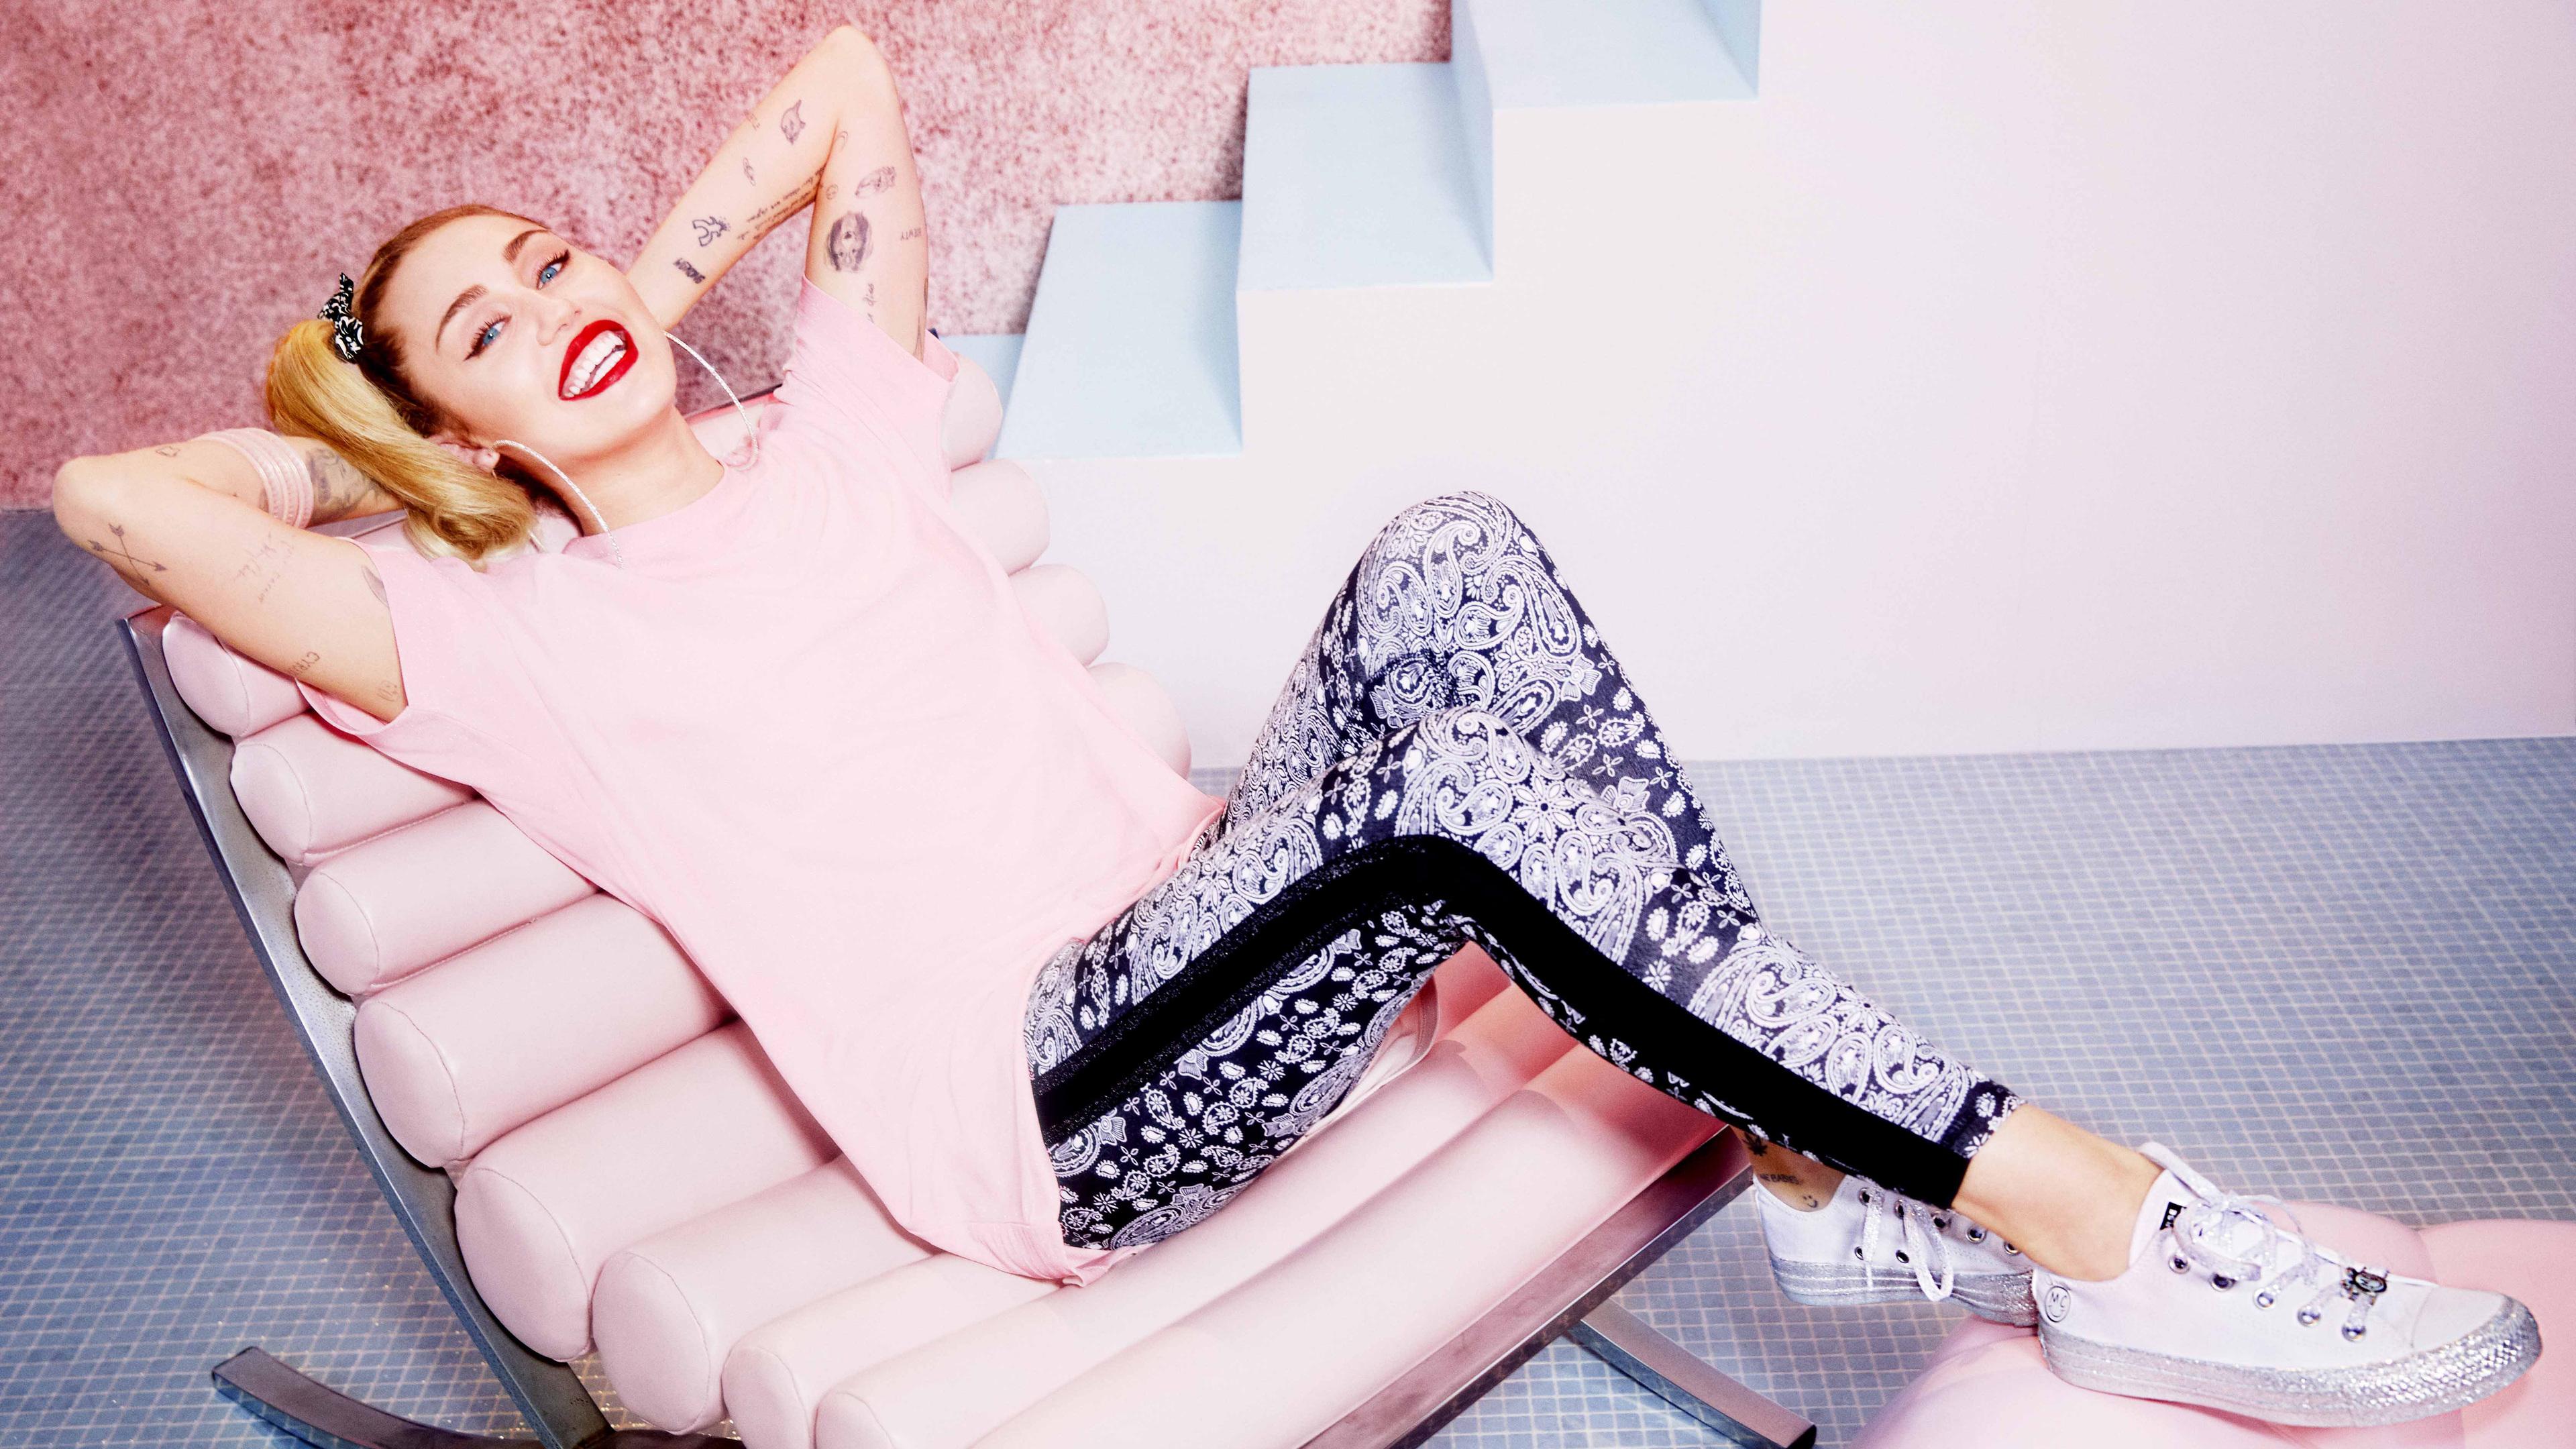 miley cyrus converse x 1536948839 - Miley Cyrus Converse X - singer wallpapers, music wallpapers, miley cyrus wallpapers, hd-wallpapers, girls wallpapers, celebrities wallpapers, 5k wallpapers, 4k-wallpapers